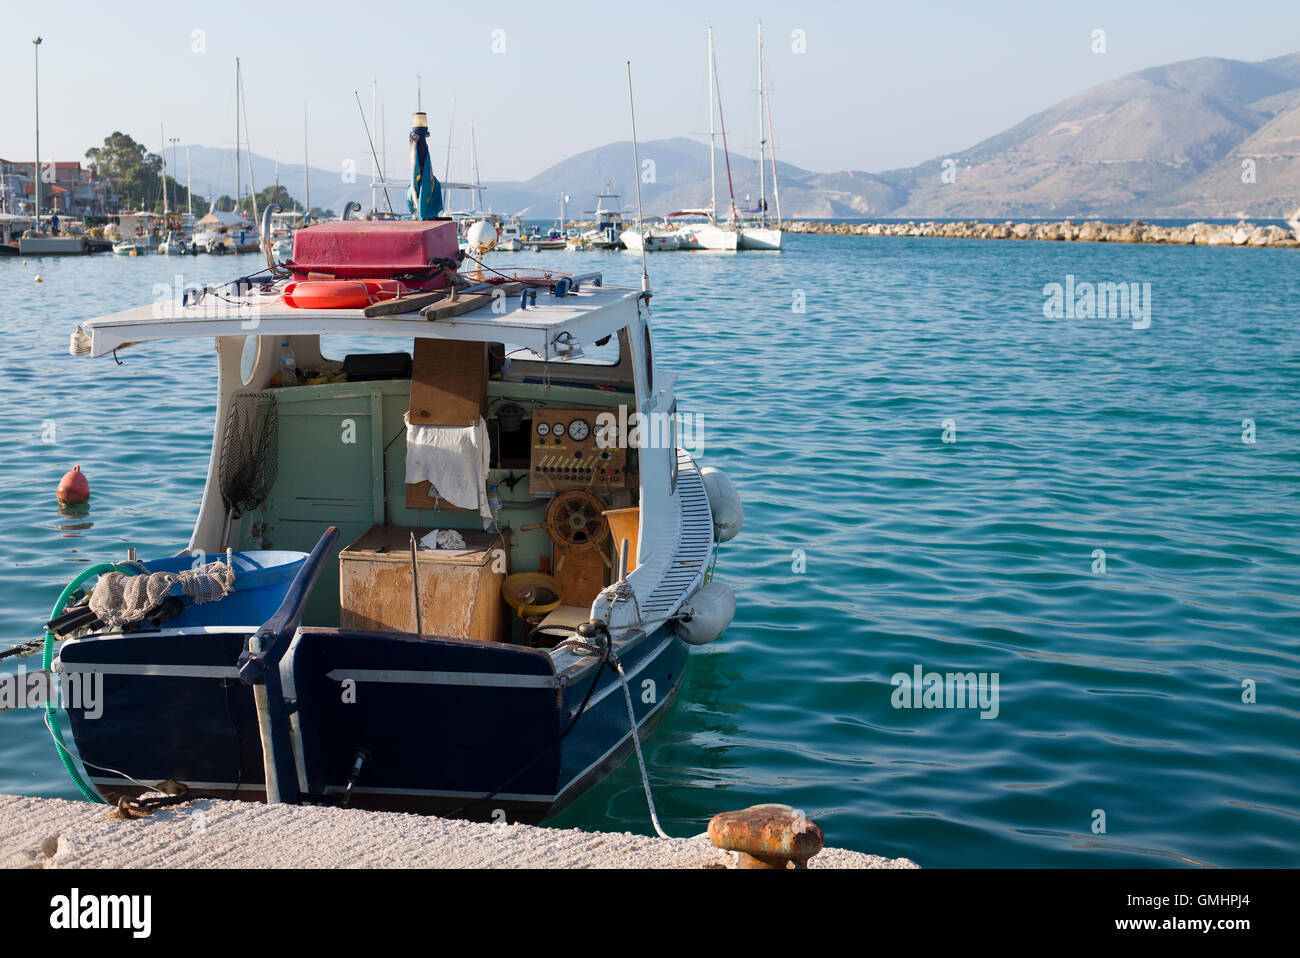 Lixouri fishing port, Kefalonia, Greece - Stock Image